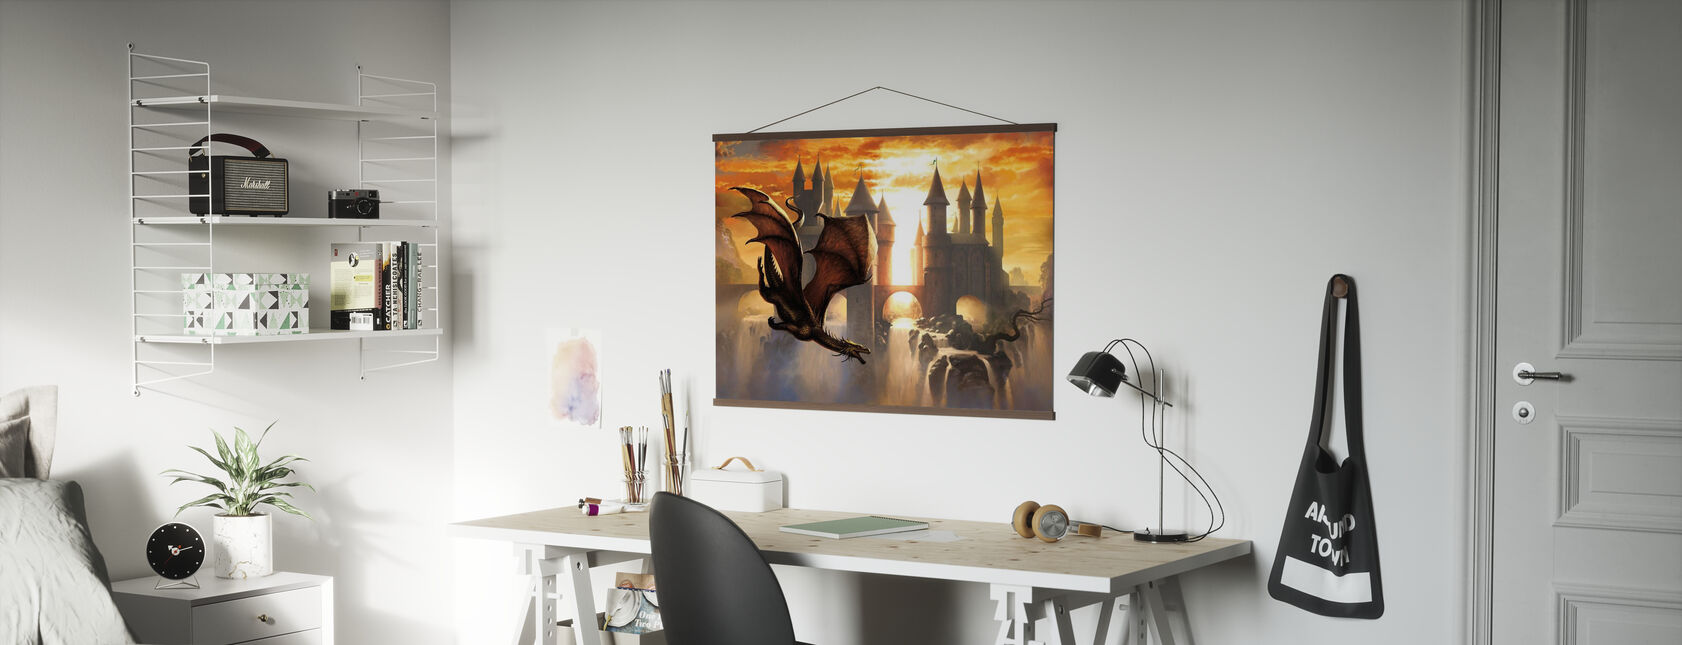 Sunset Dragon - Poster - Office